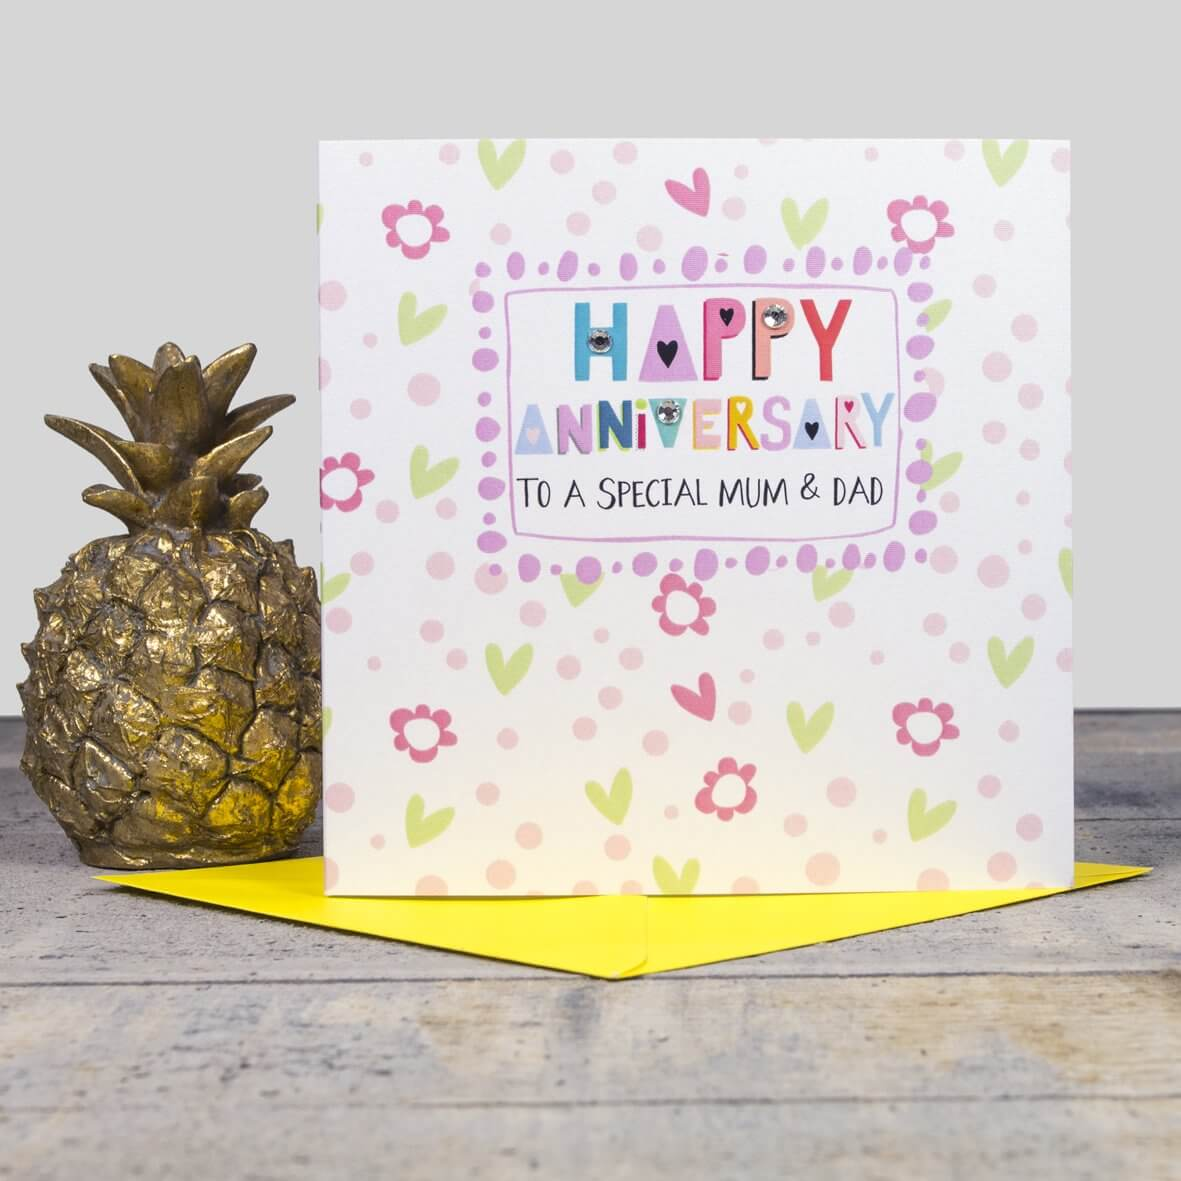 Happy Anniversary Card - Mum and Dad